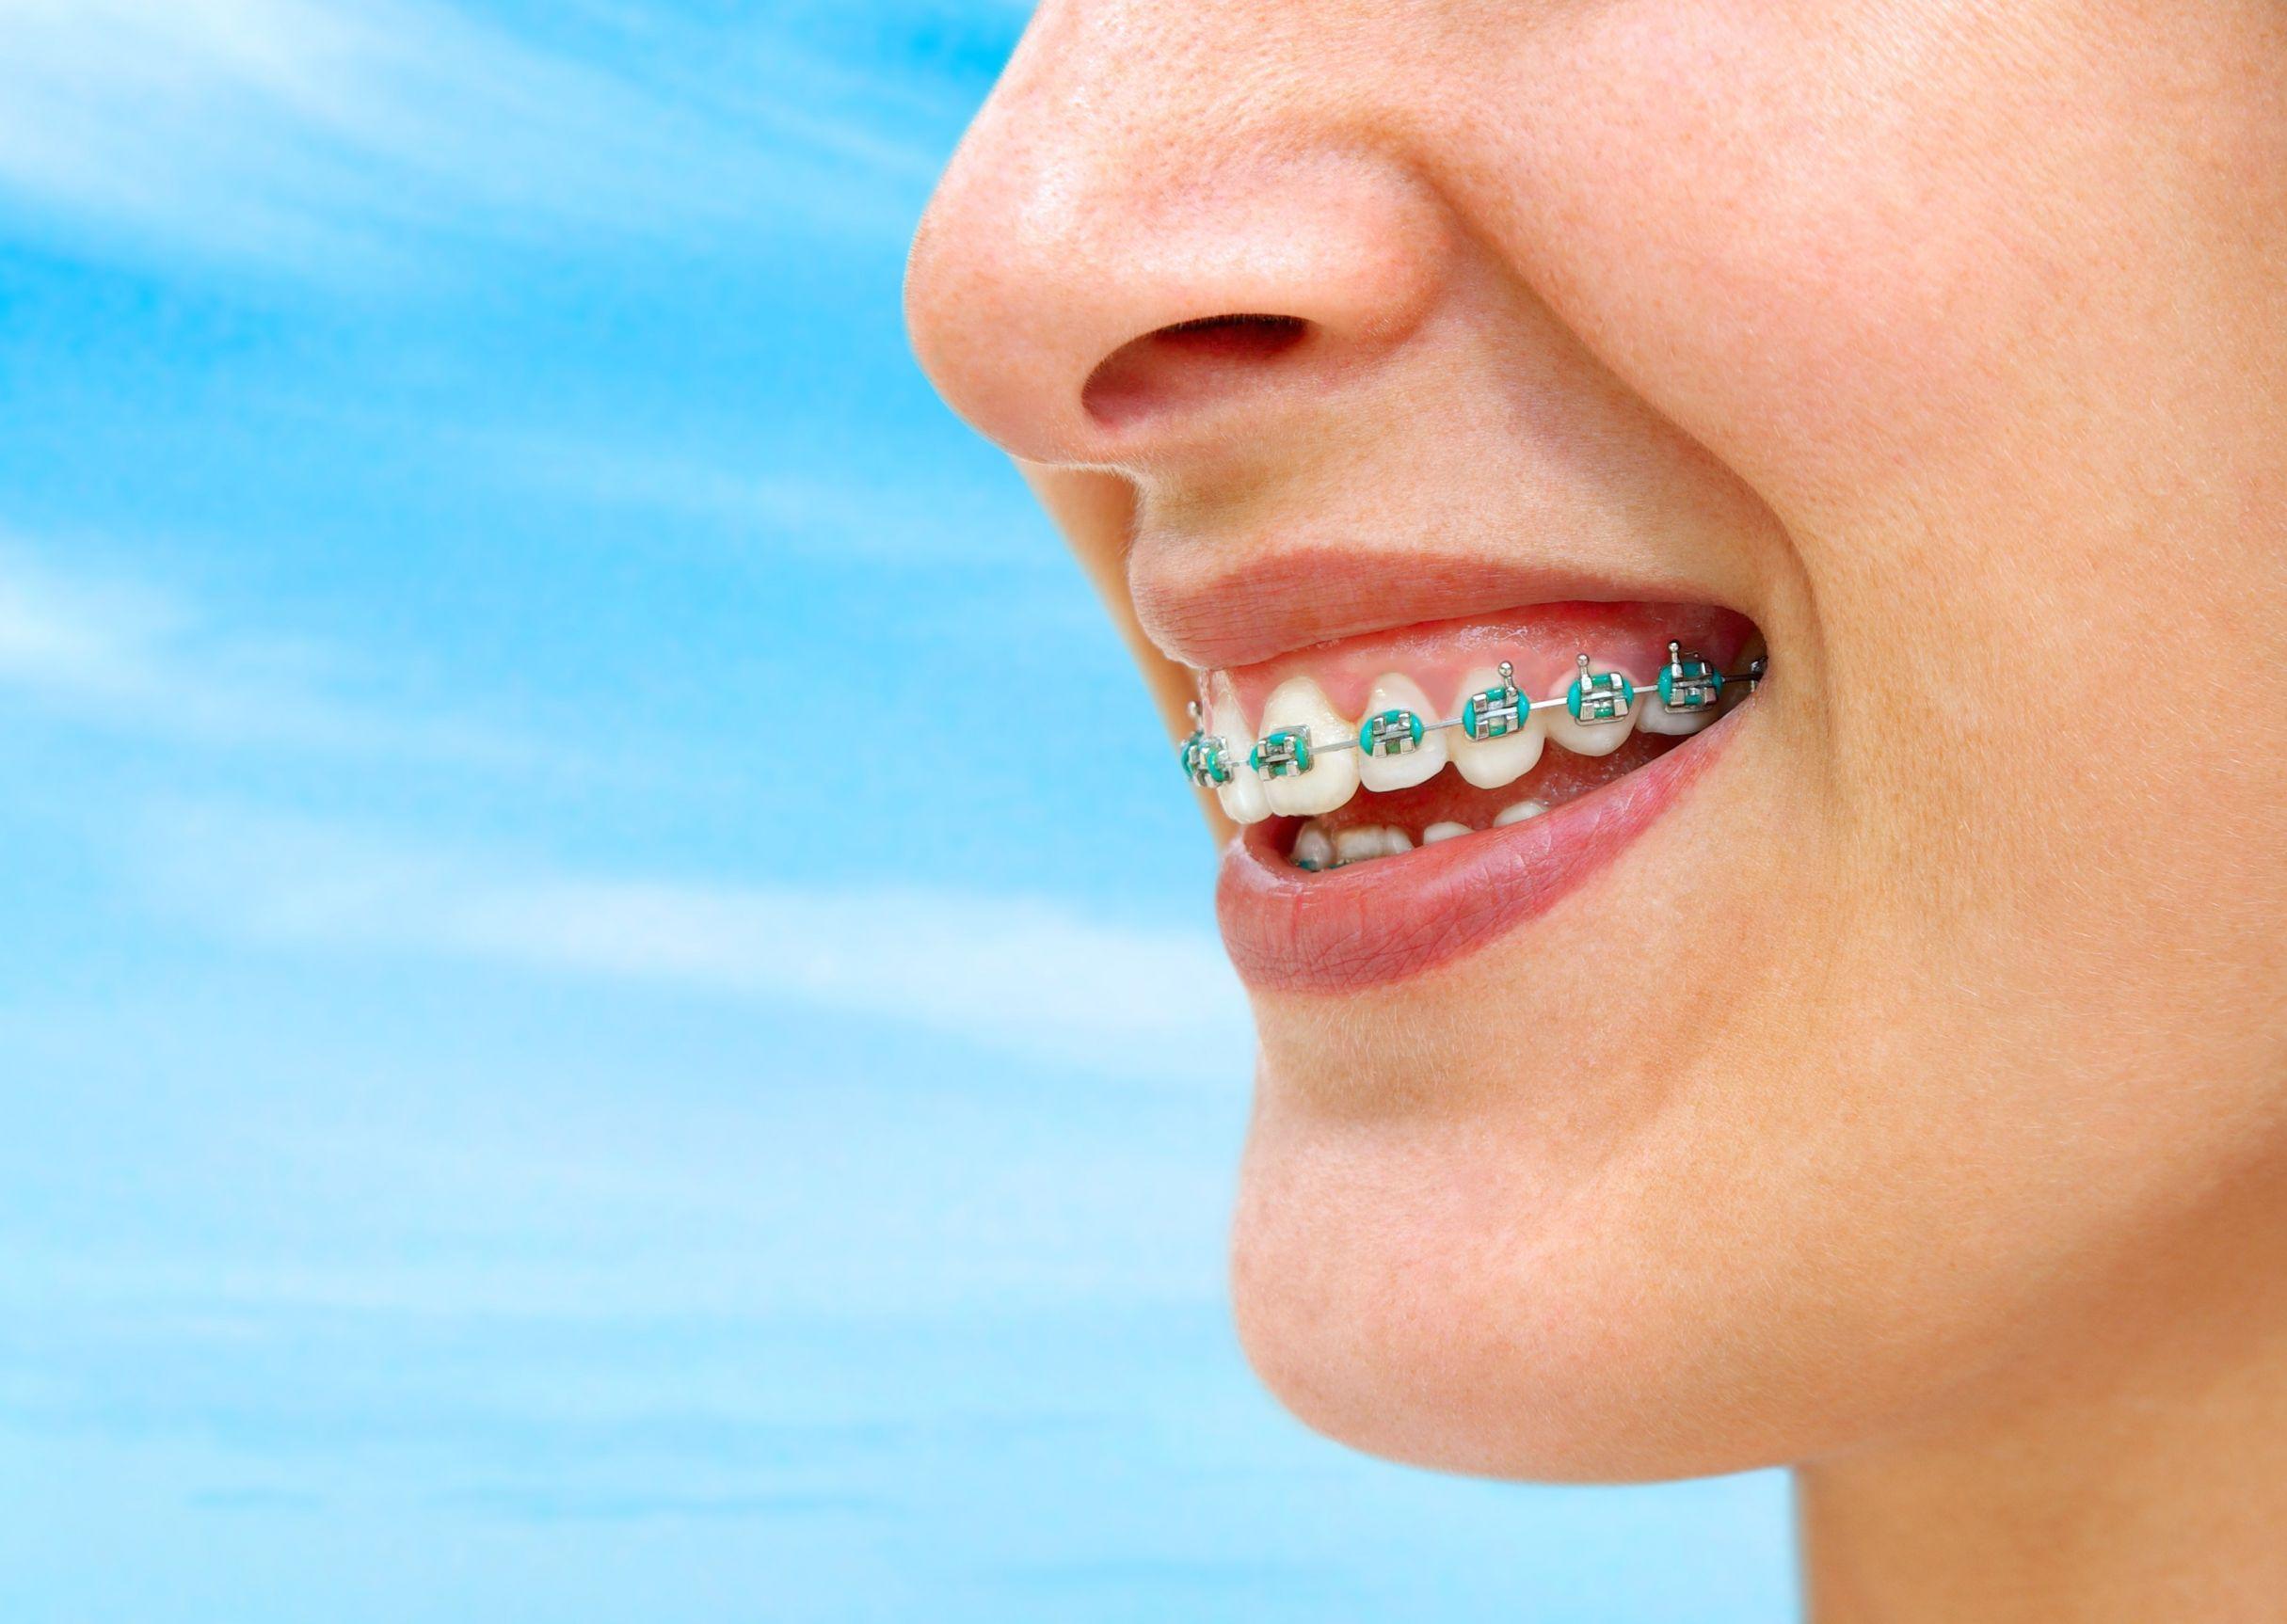 17 best ideas about orthodontic treatment on pinterest